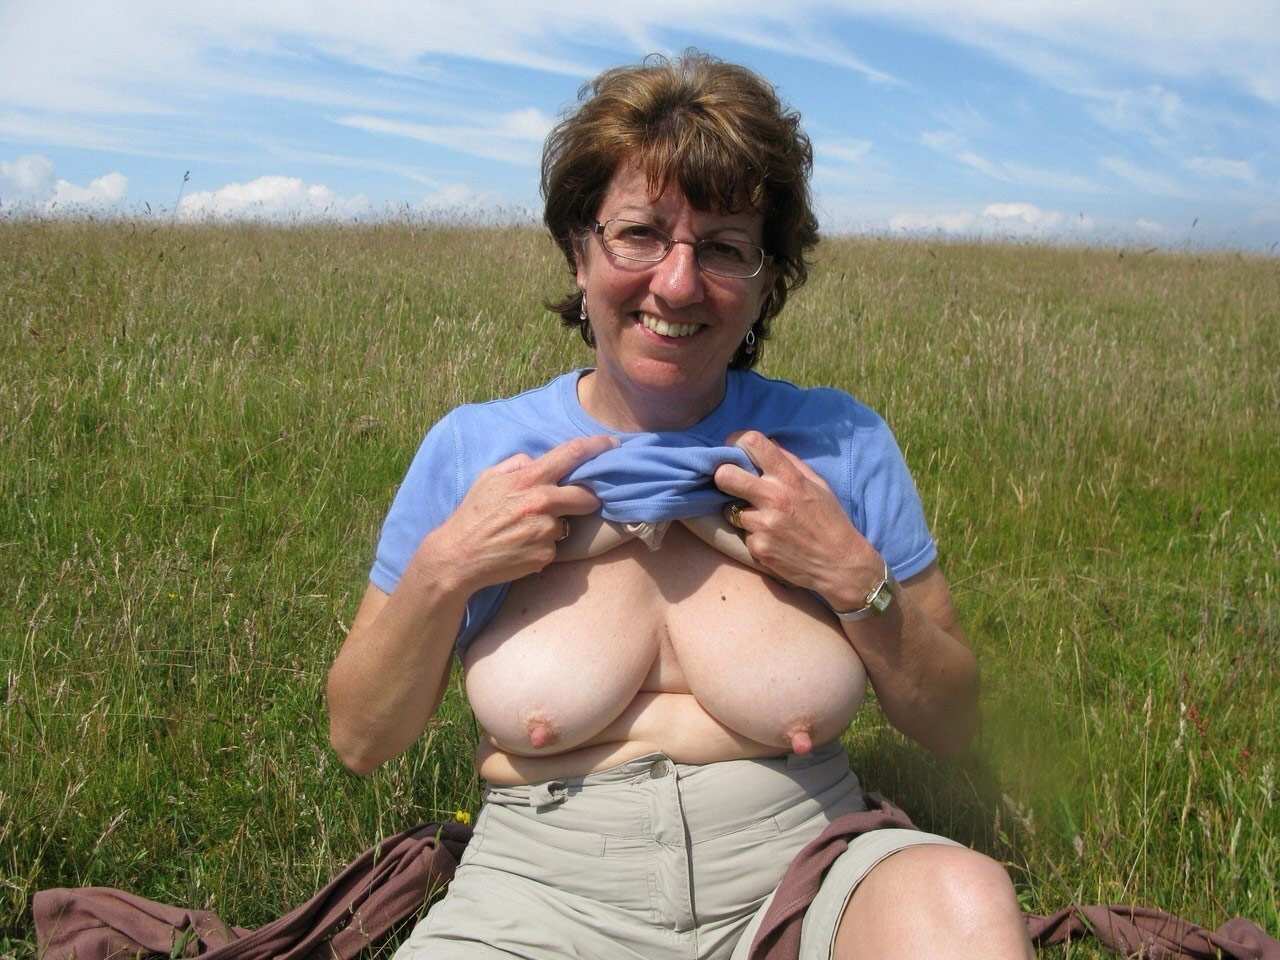 Mature women with medium tits